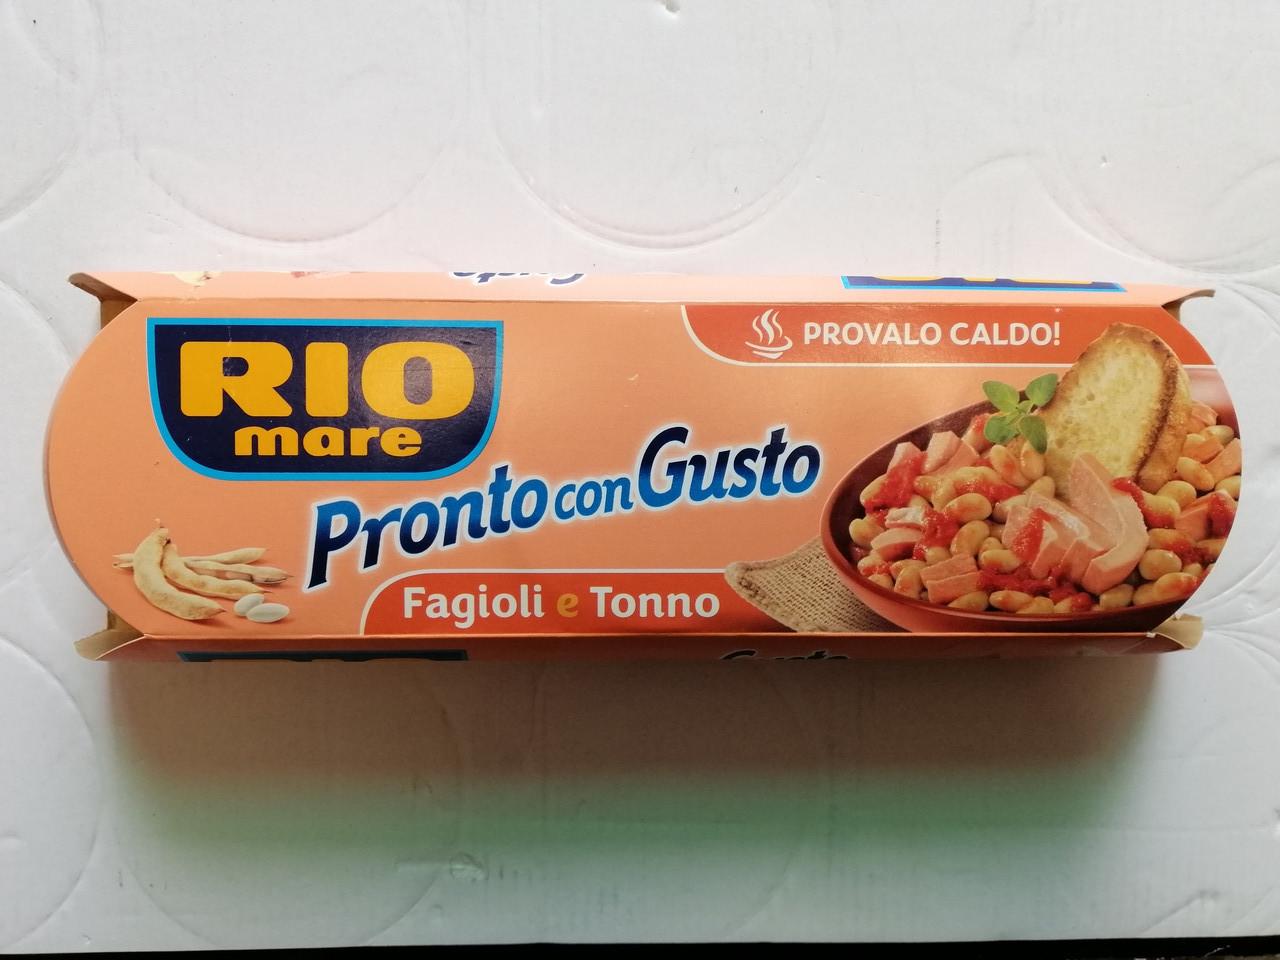 Тунец Rio Mare ProntoConGusto с томатом и фасолью Fagioli e Tonno, 3х160 г.